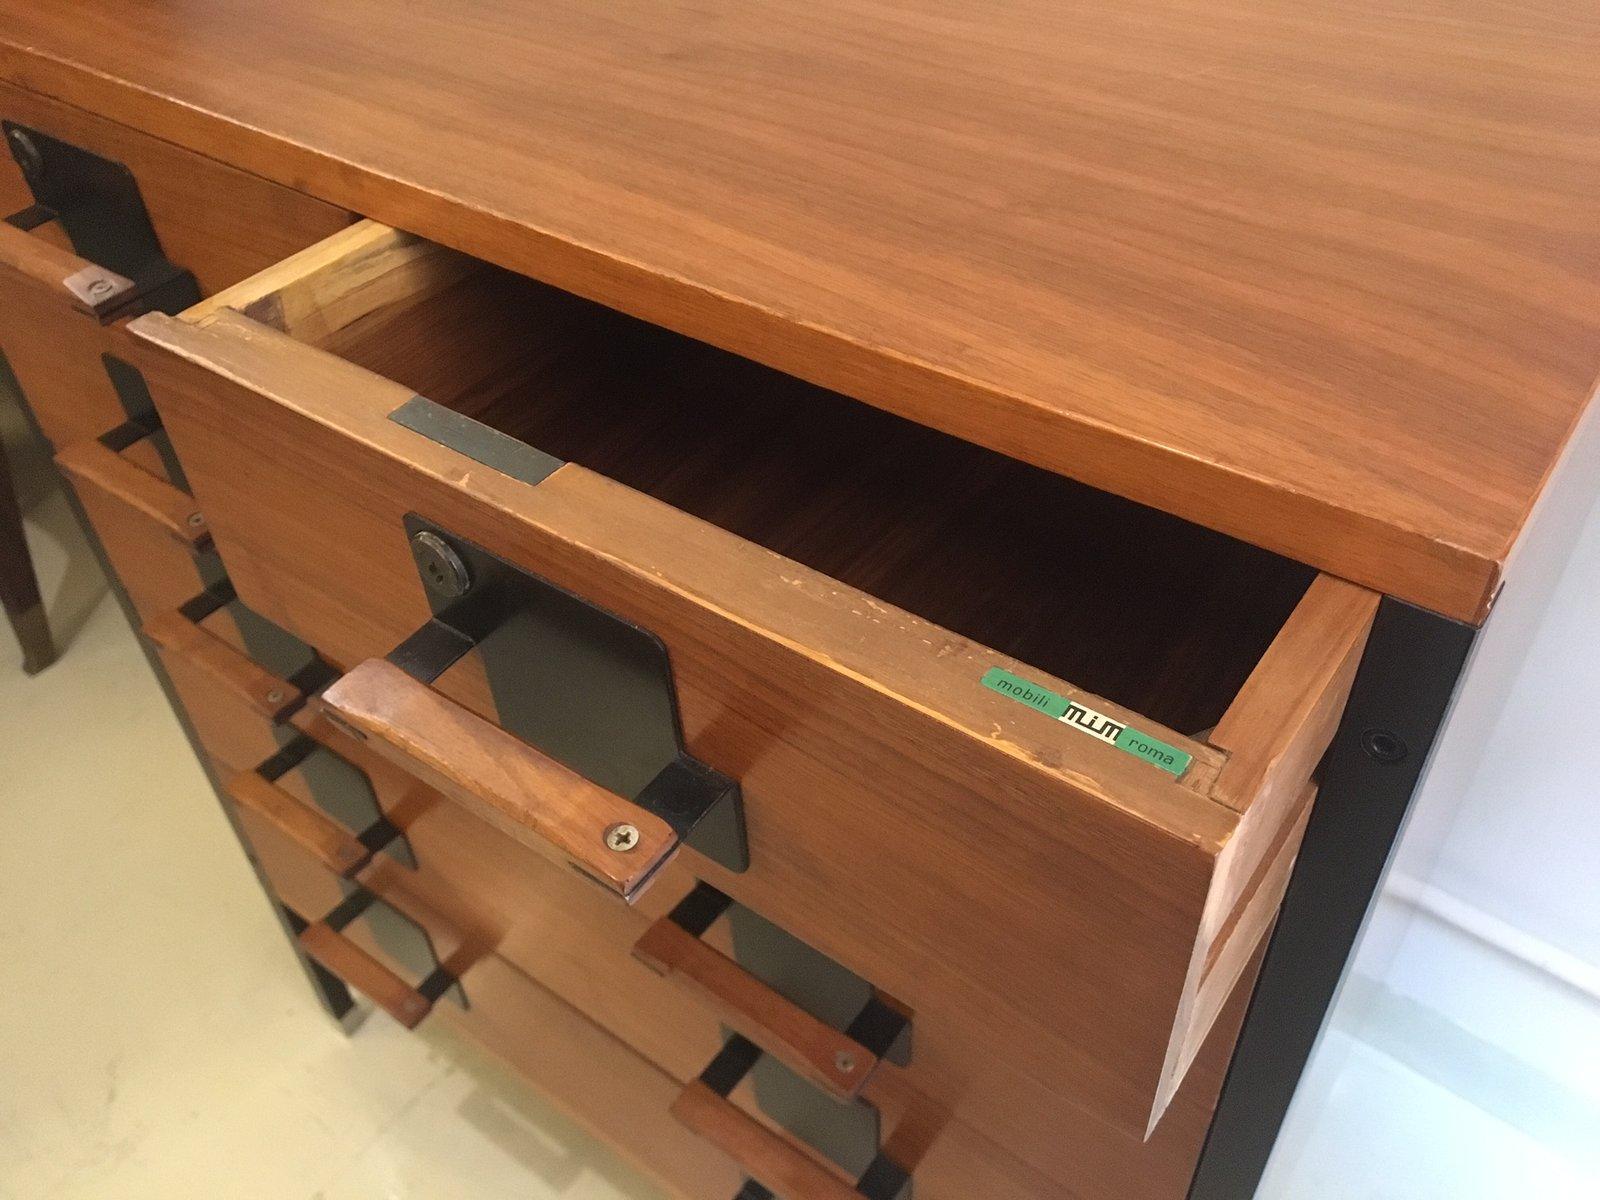 Mobili Italiani Moderni : Positano chest by ico & luisa parisi for mobili italiani moderni